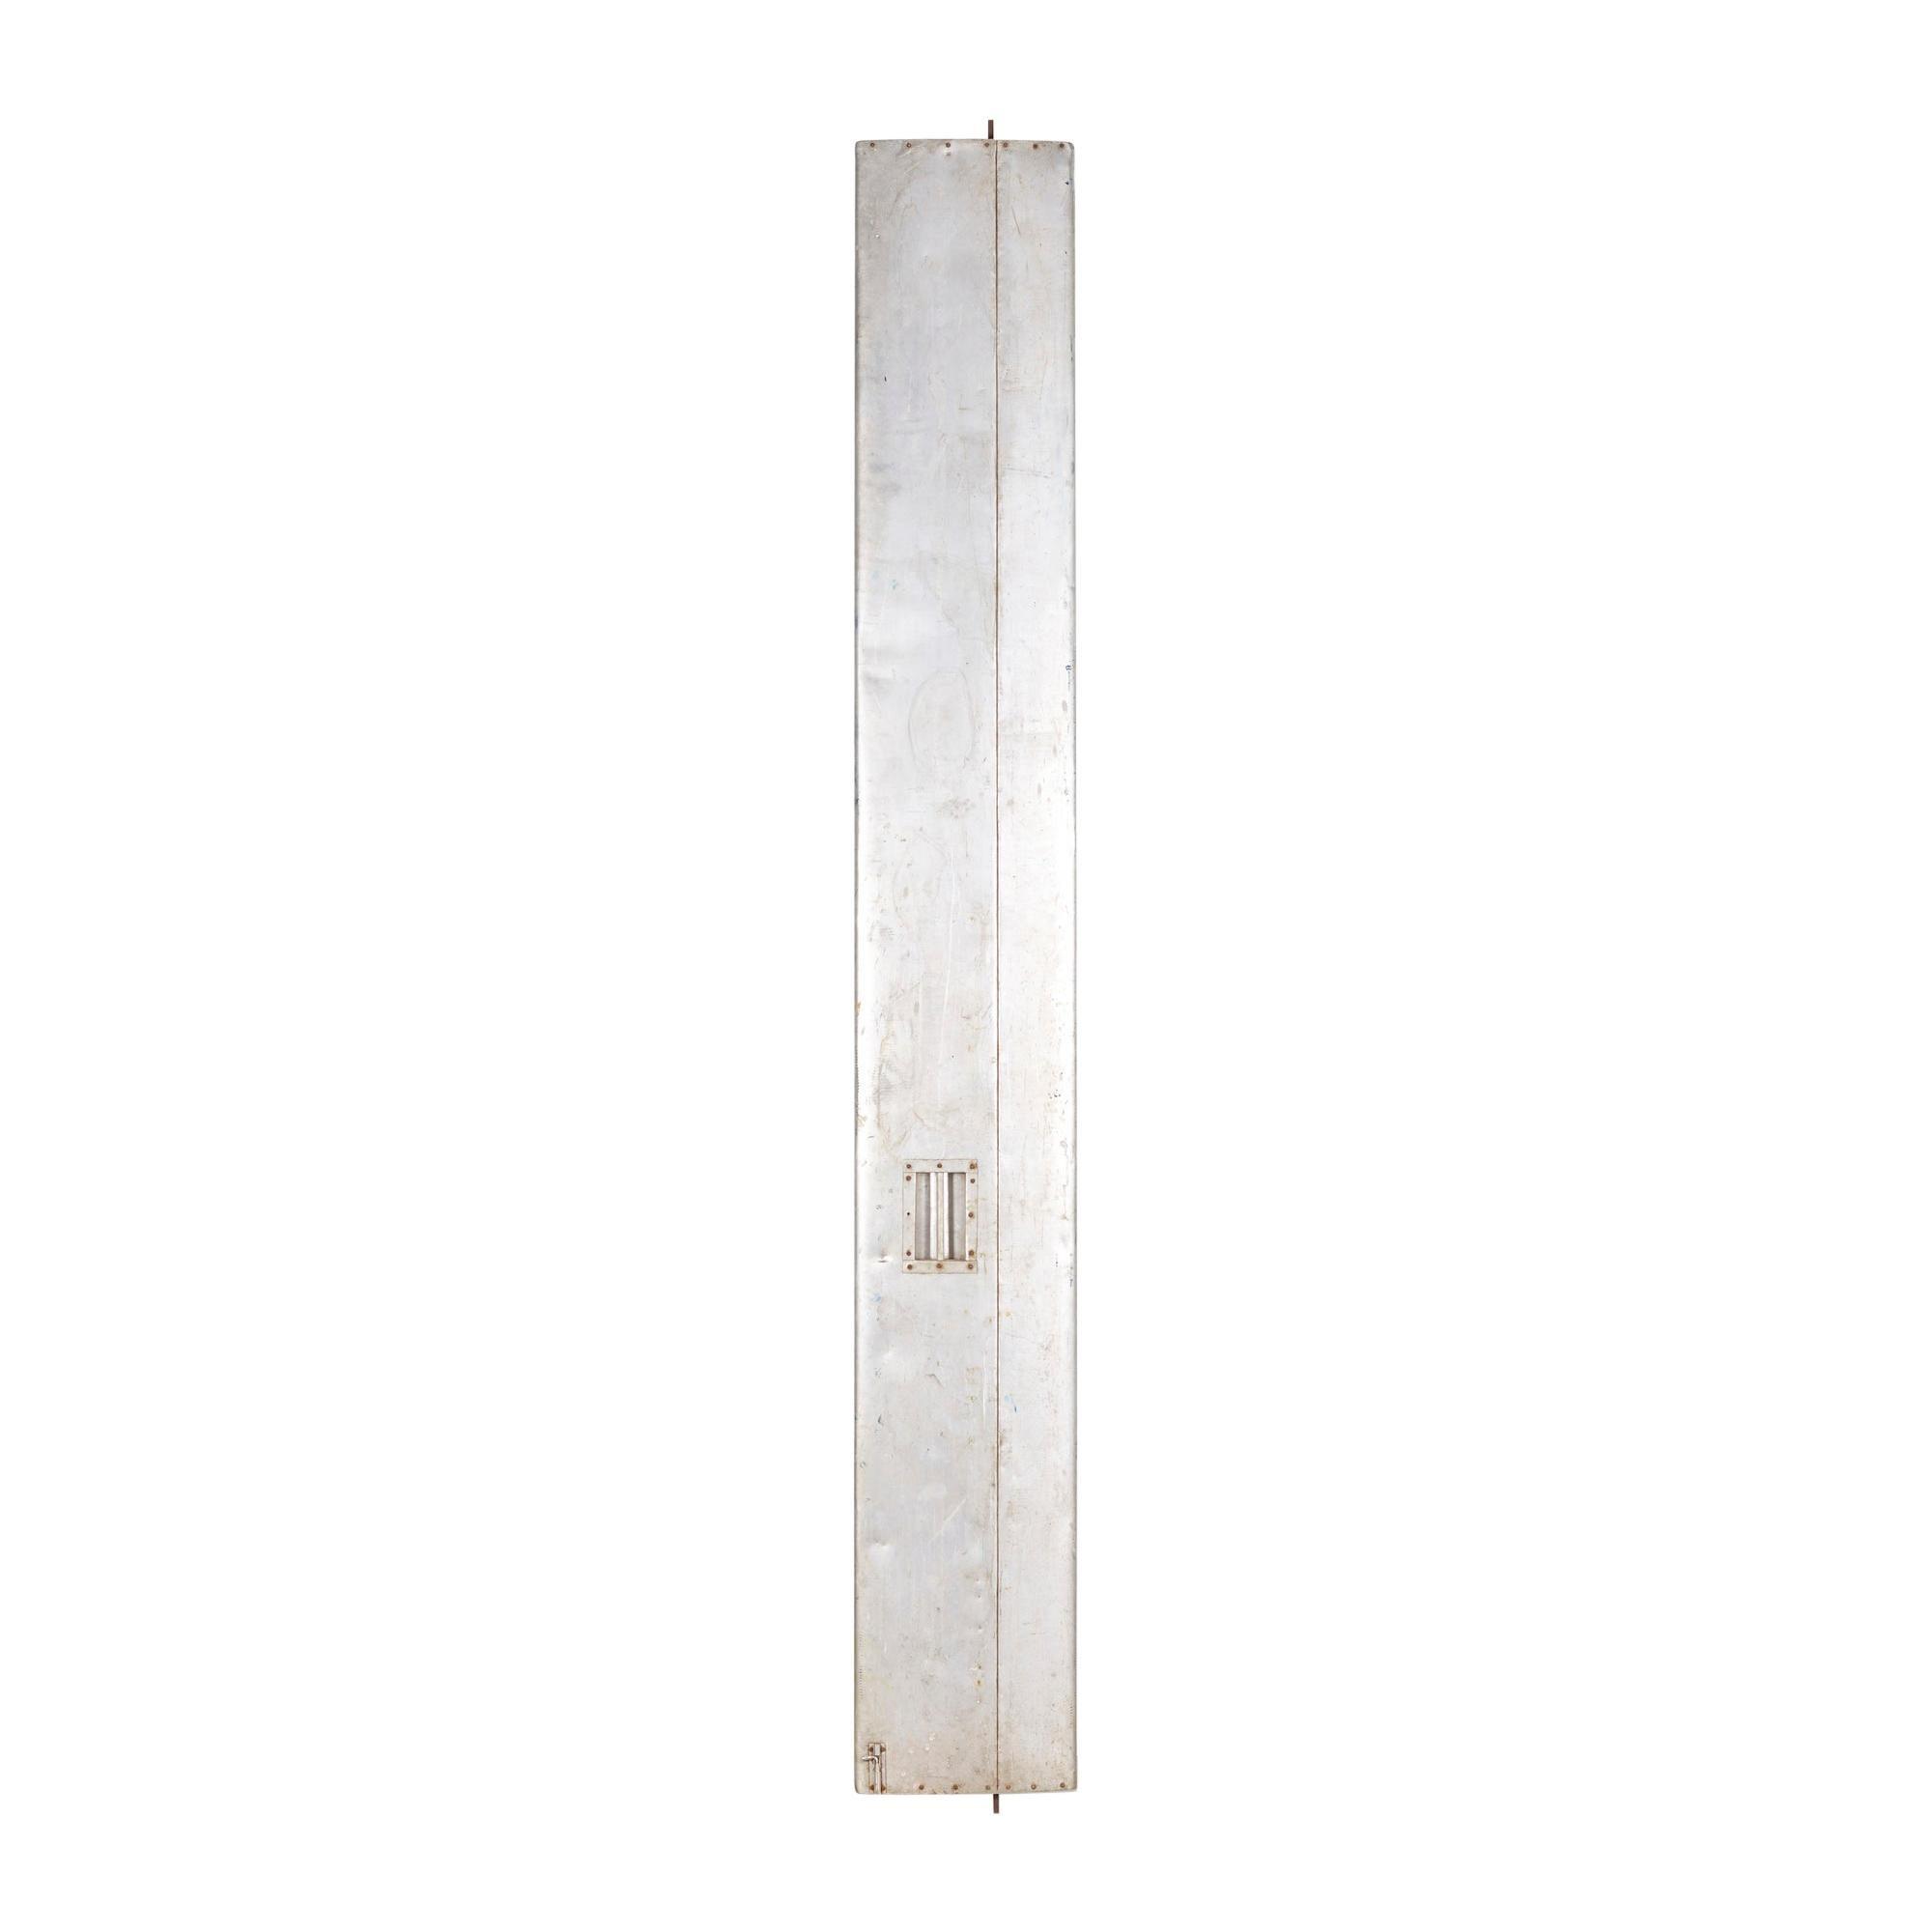 Le Corbusier Ventilator Shutter from Chandigarh